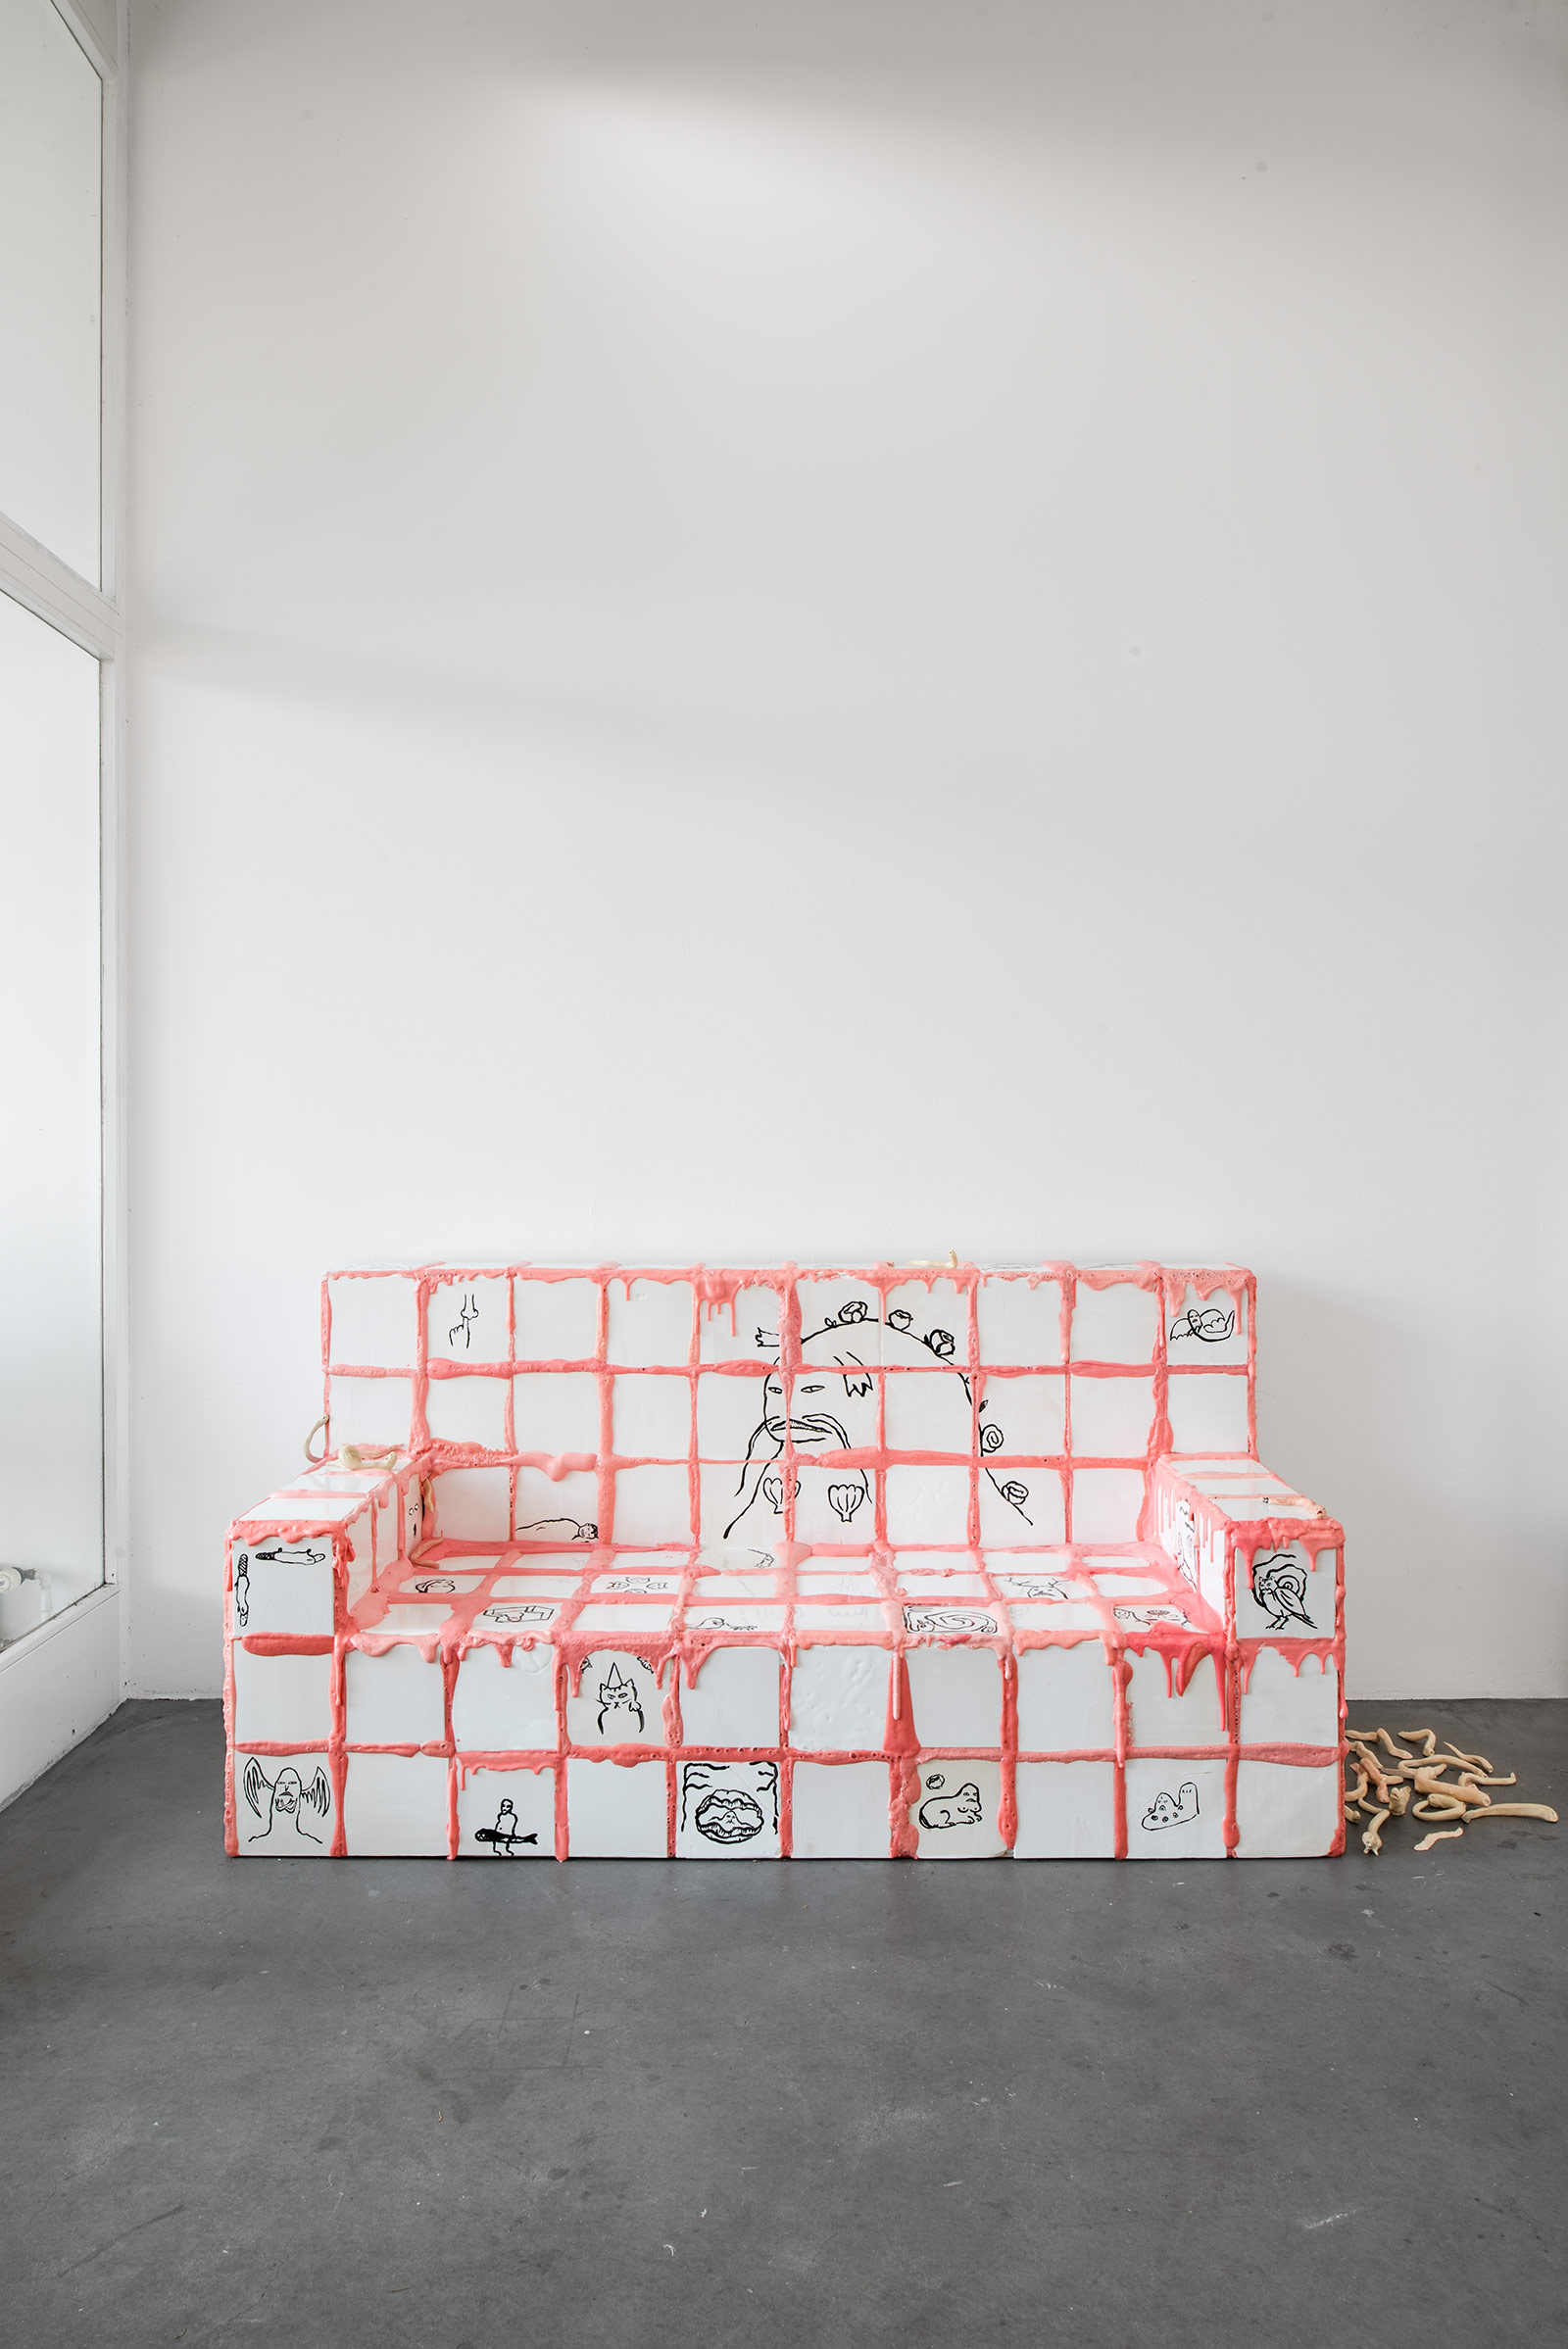 Manuela Cossalter – Institut Kunst, Diplom 2017